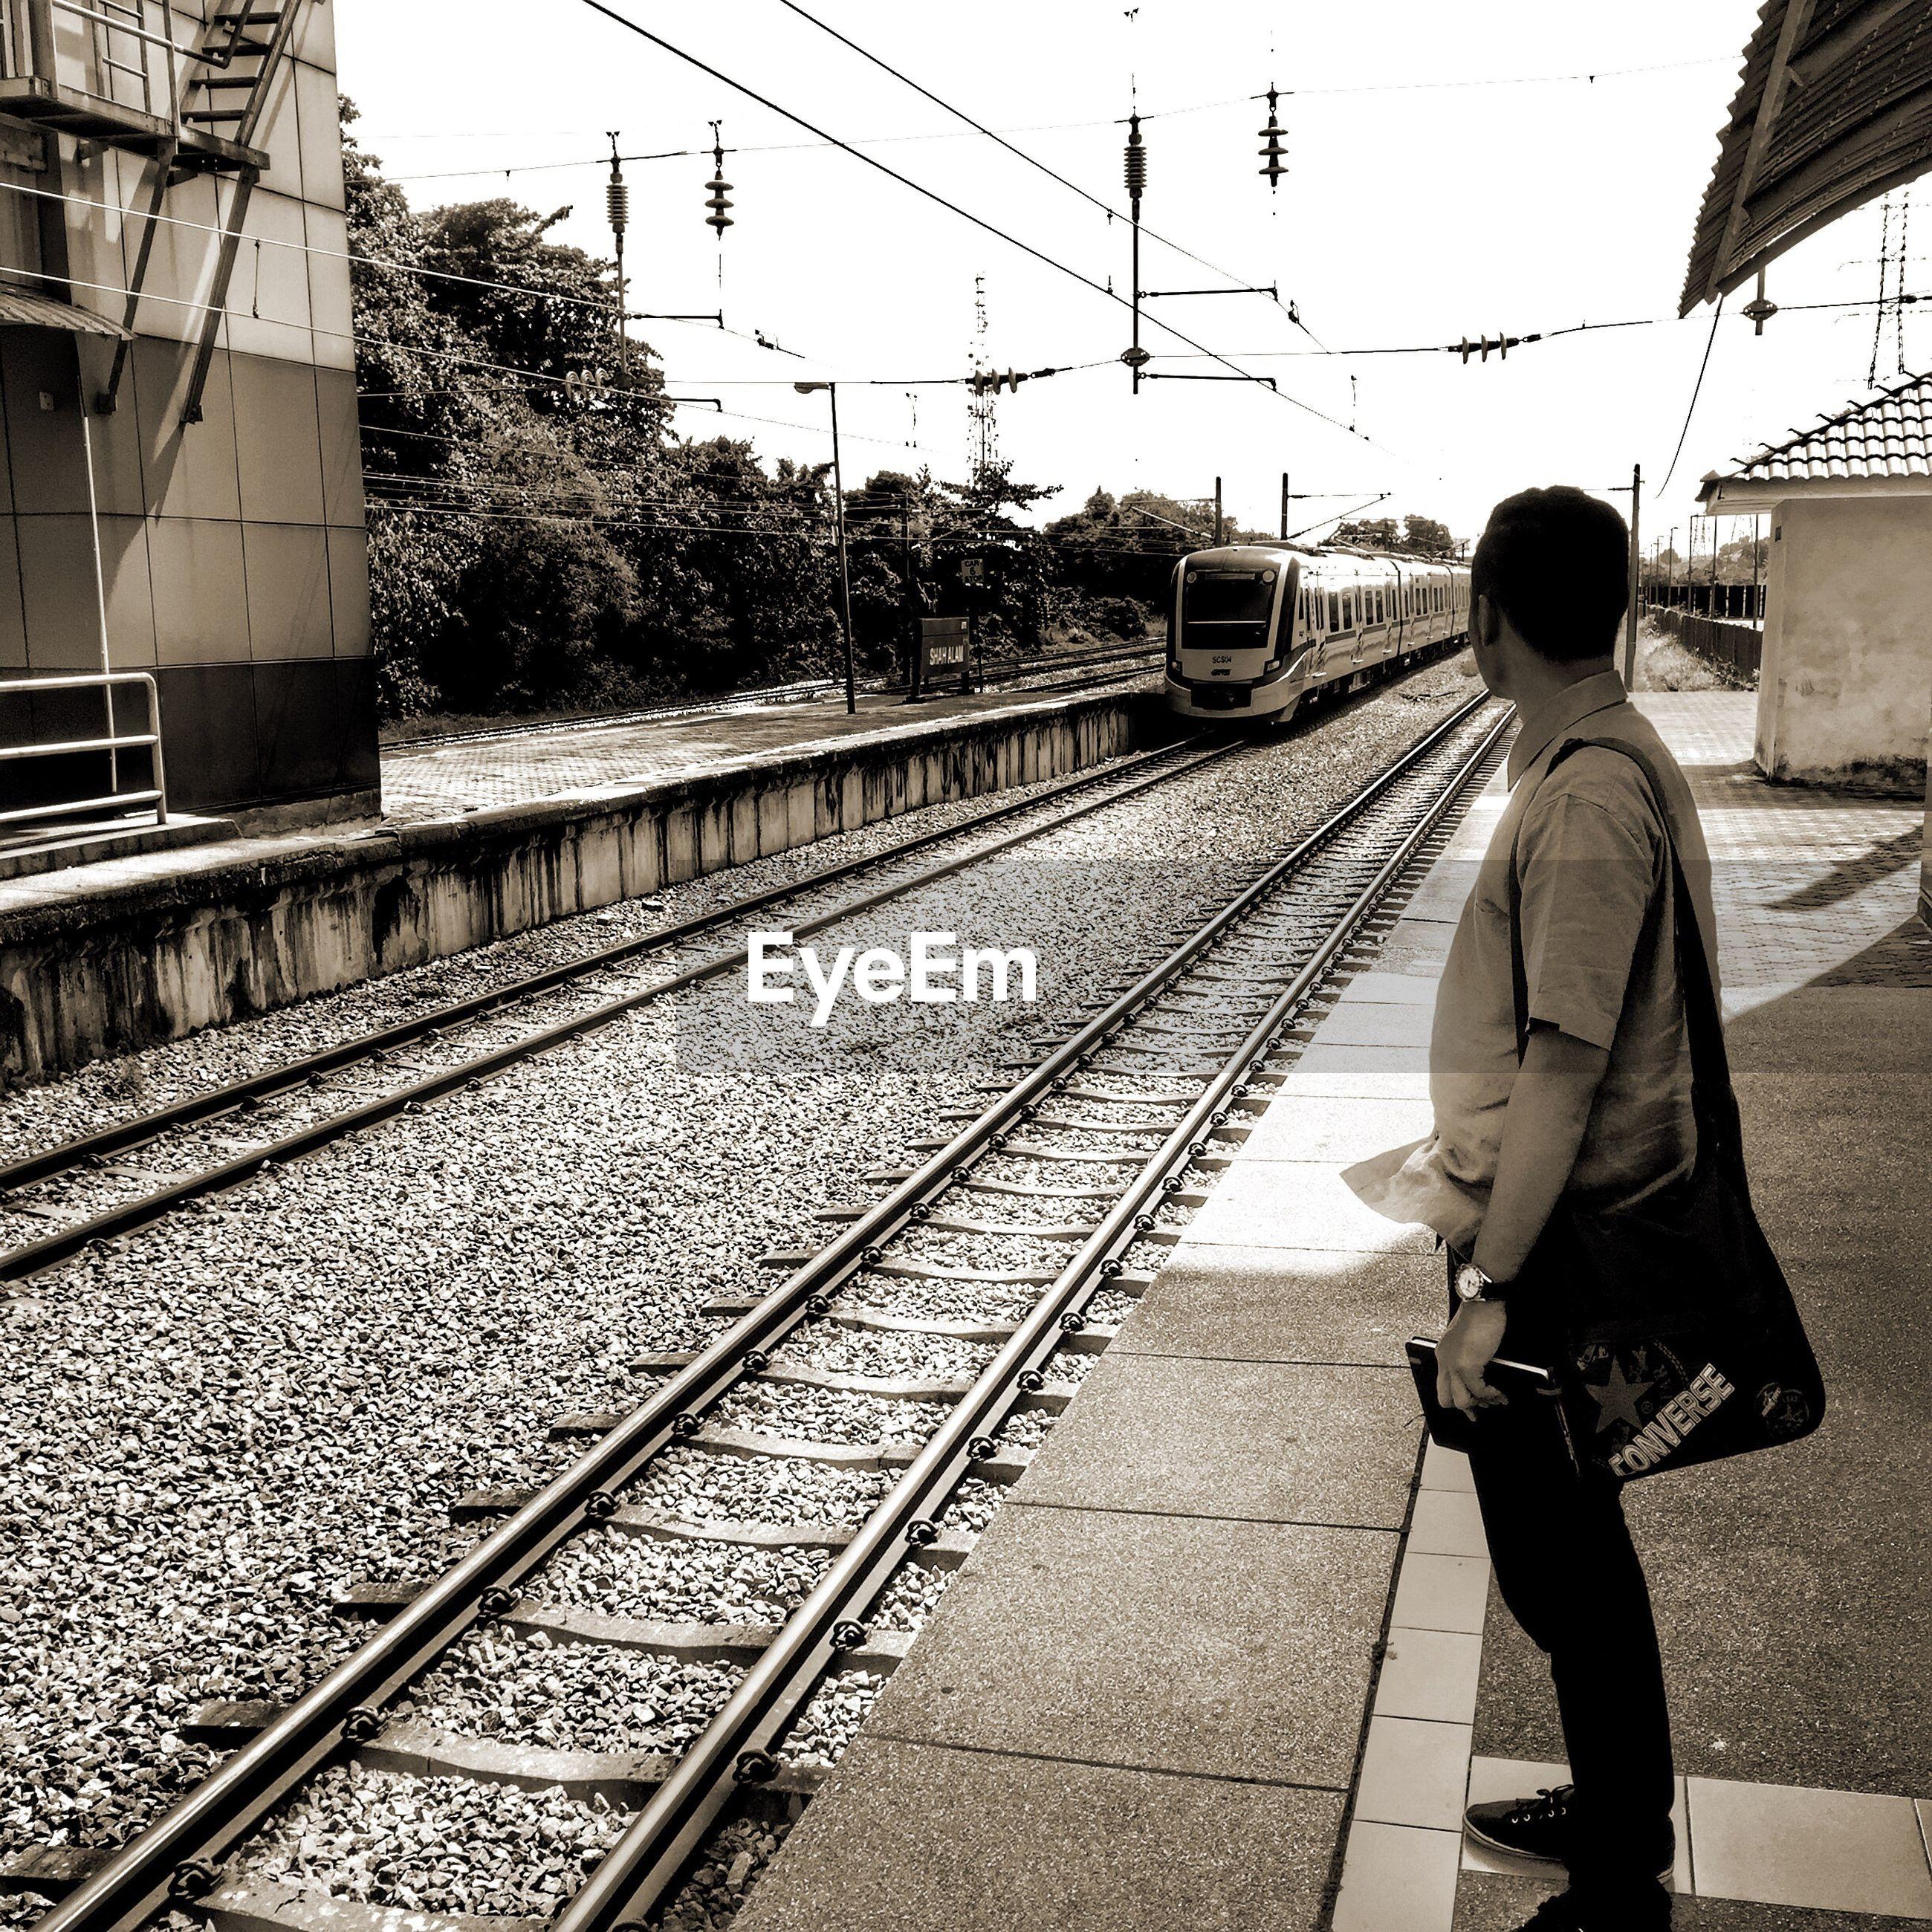 railroad track, transportation, rail transportation, railroad station platform, lifestyles, rear view, men, public transportation, full length, railroad station, walking, the way forward, leisure activity, built structure, travel, connection, architecture, diminishing perspective